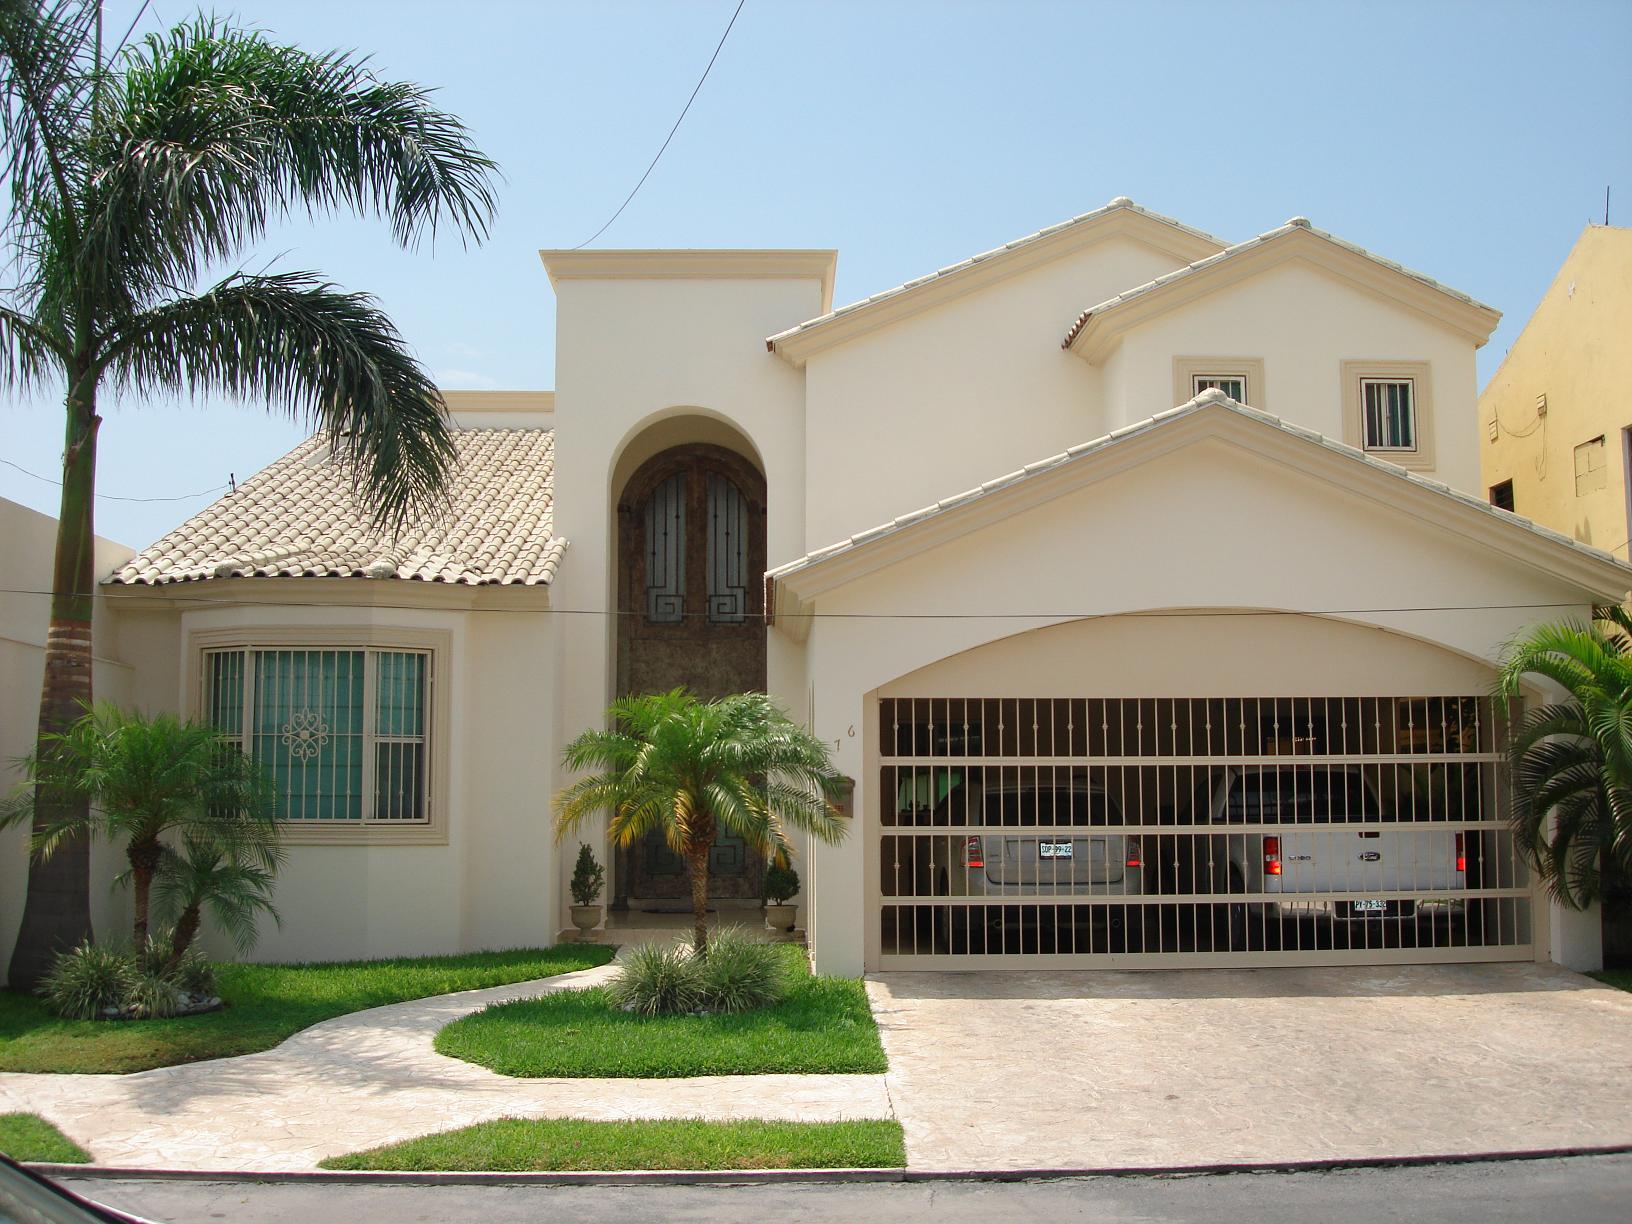 Casas en chihuahua domestika - Decoracion de entradas de casas ...